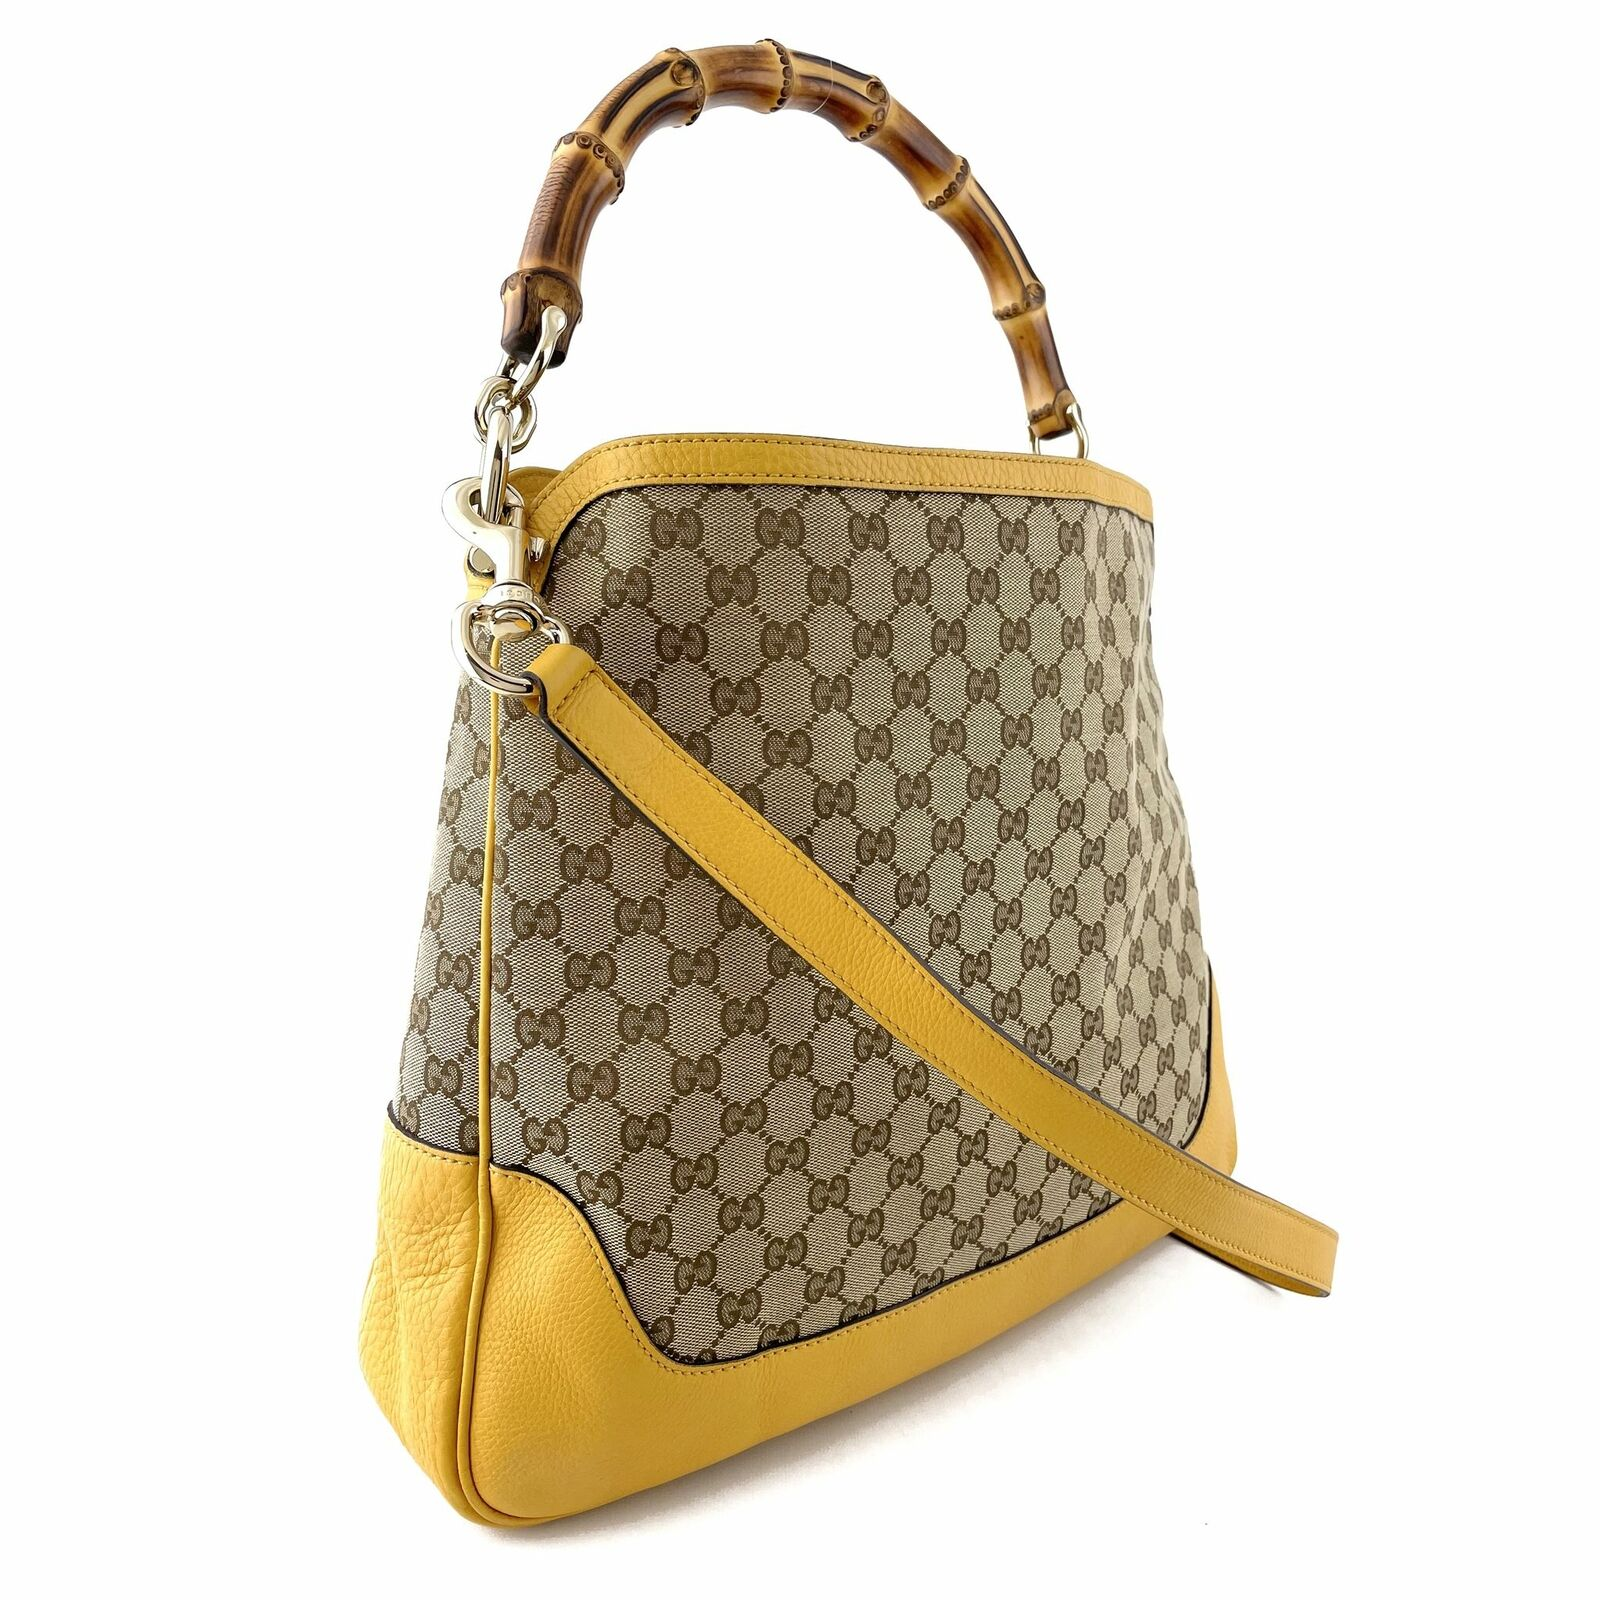 Gucci GG Canvas Diana Bamboo Shoulder Bag - Beige… - image 2